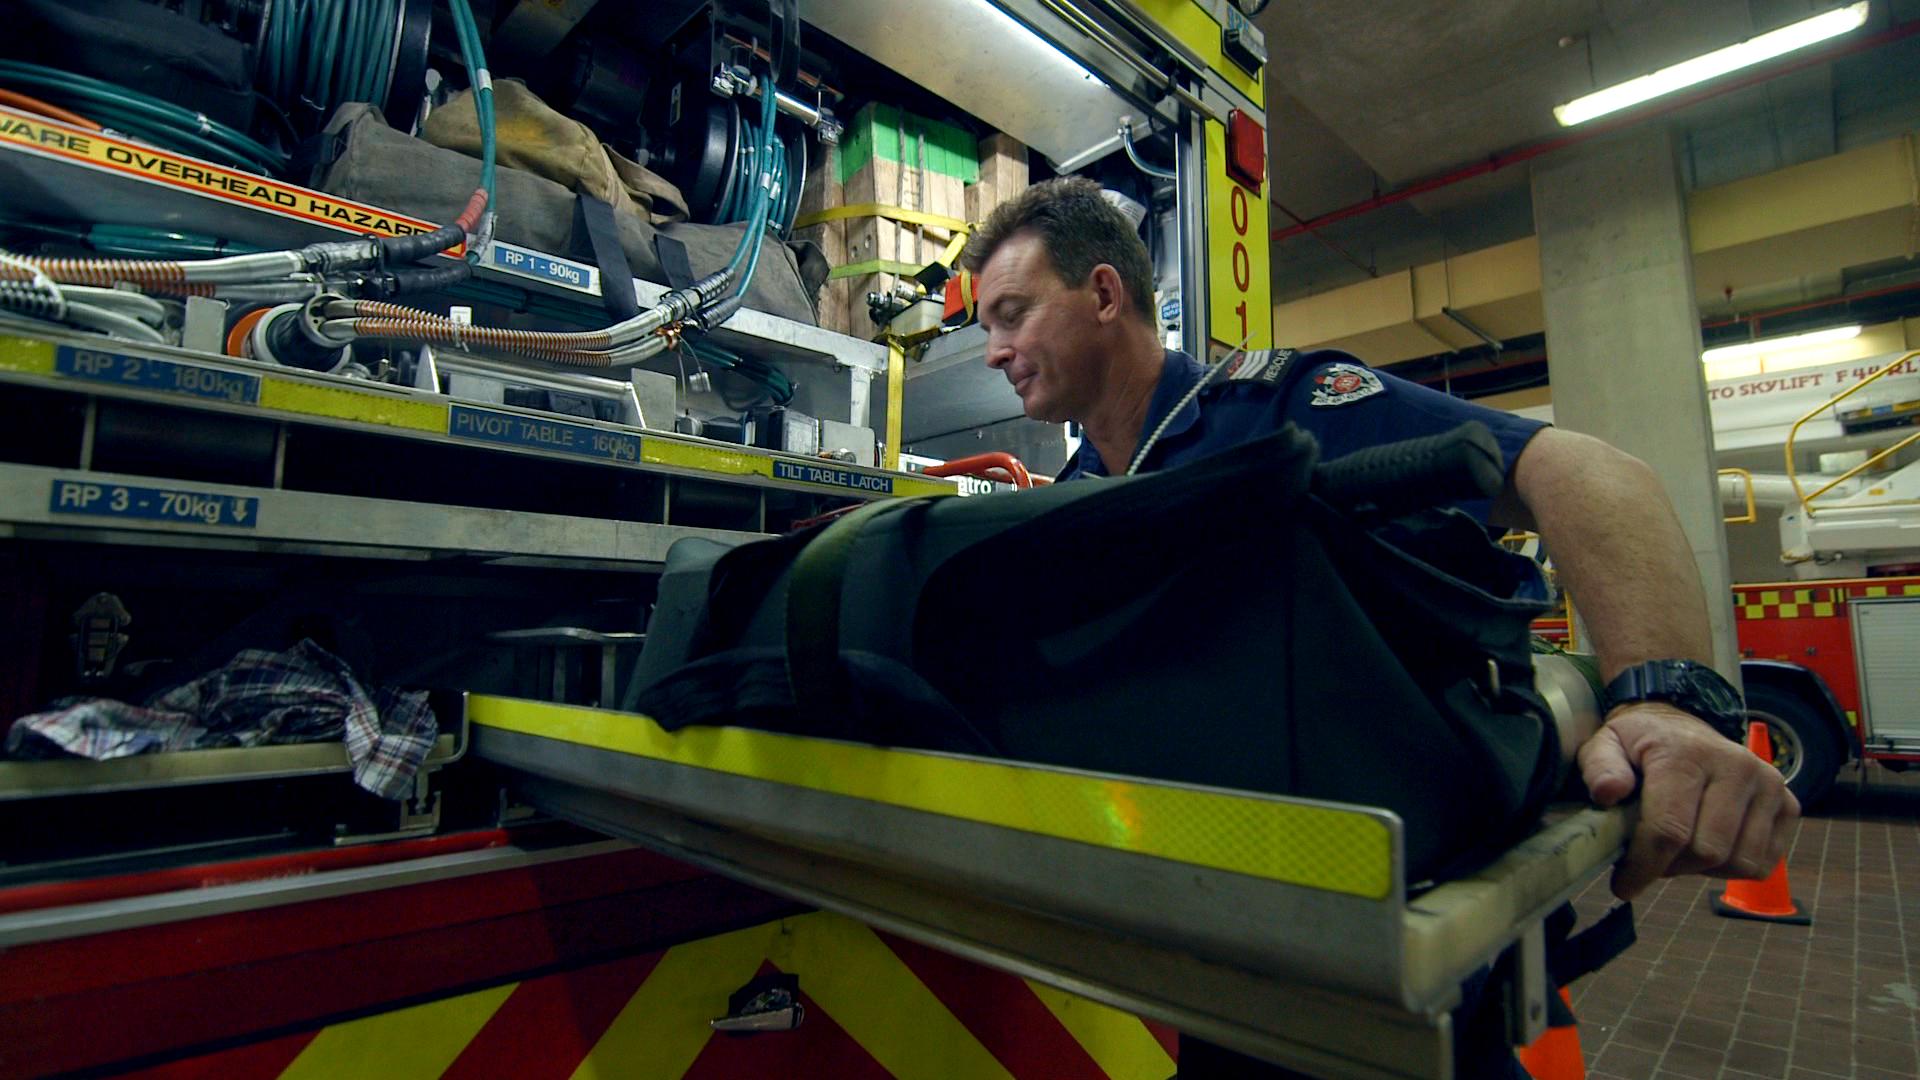 Poster boy for early mental health intervention, firefighter Peter Kirwan